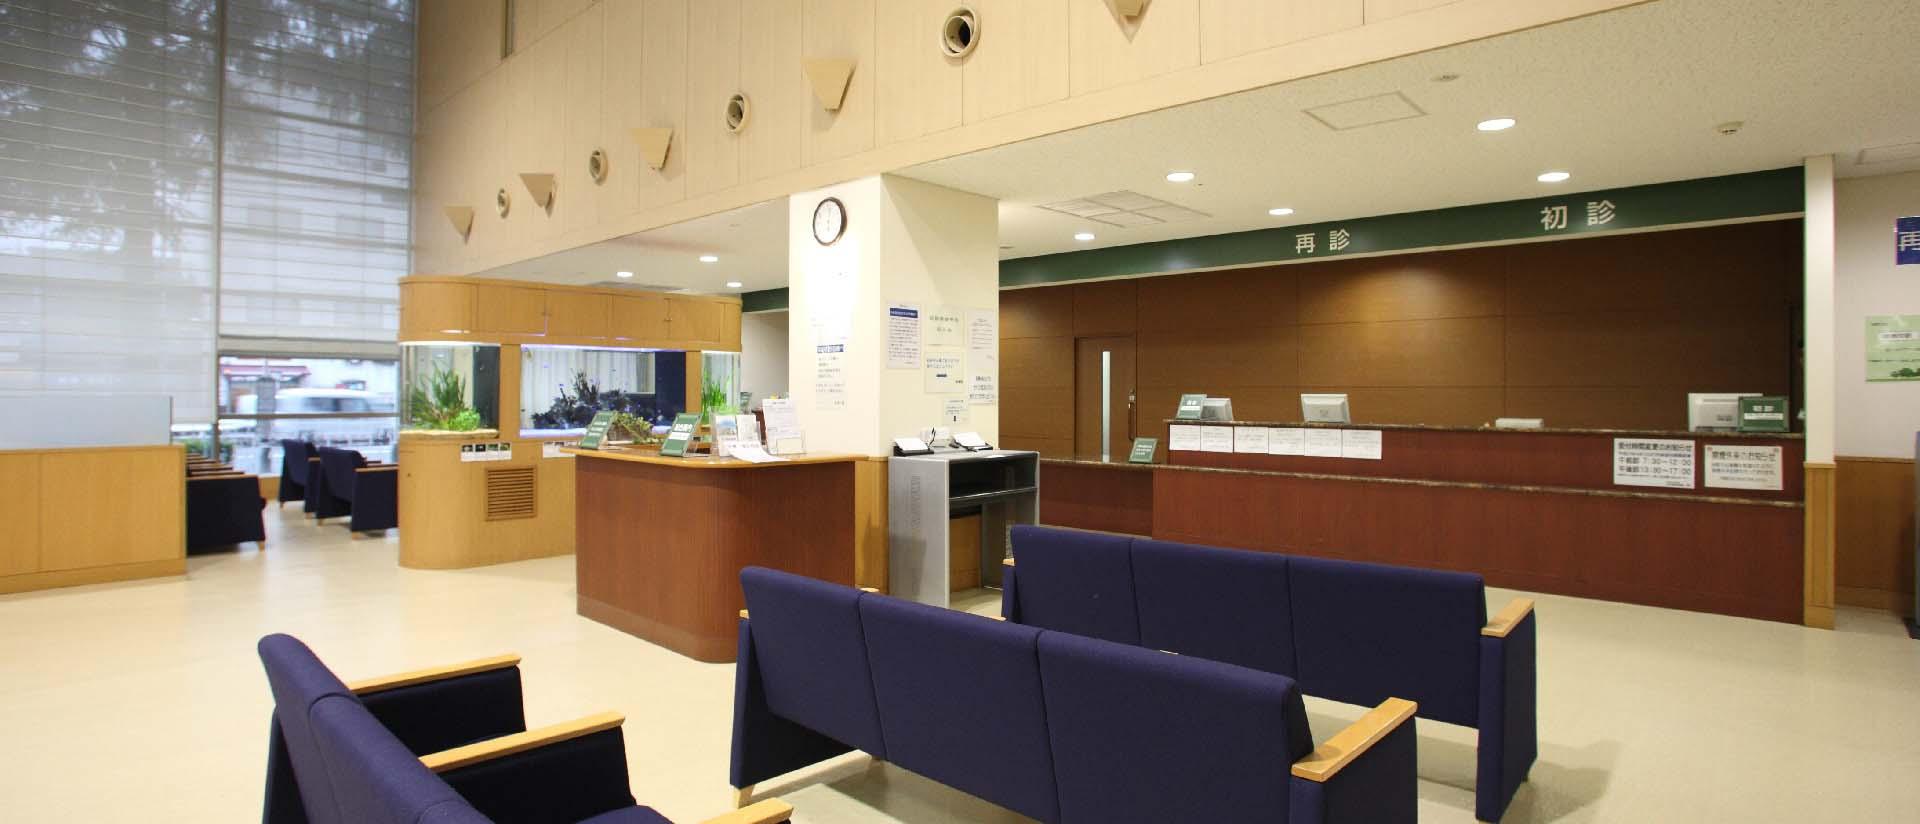 hospital_01